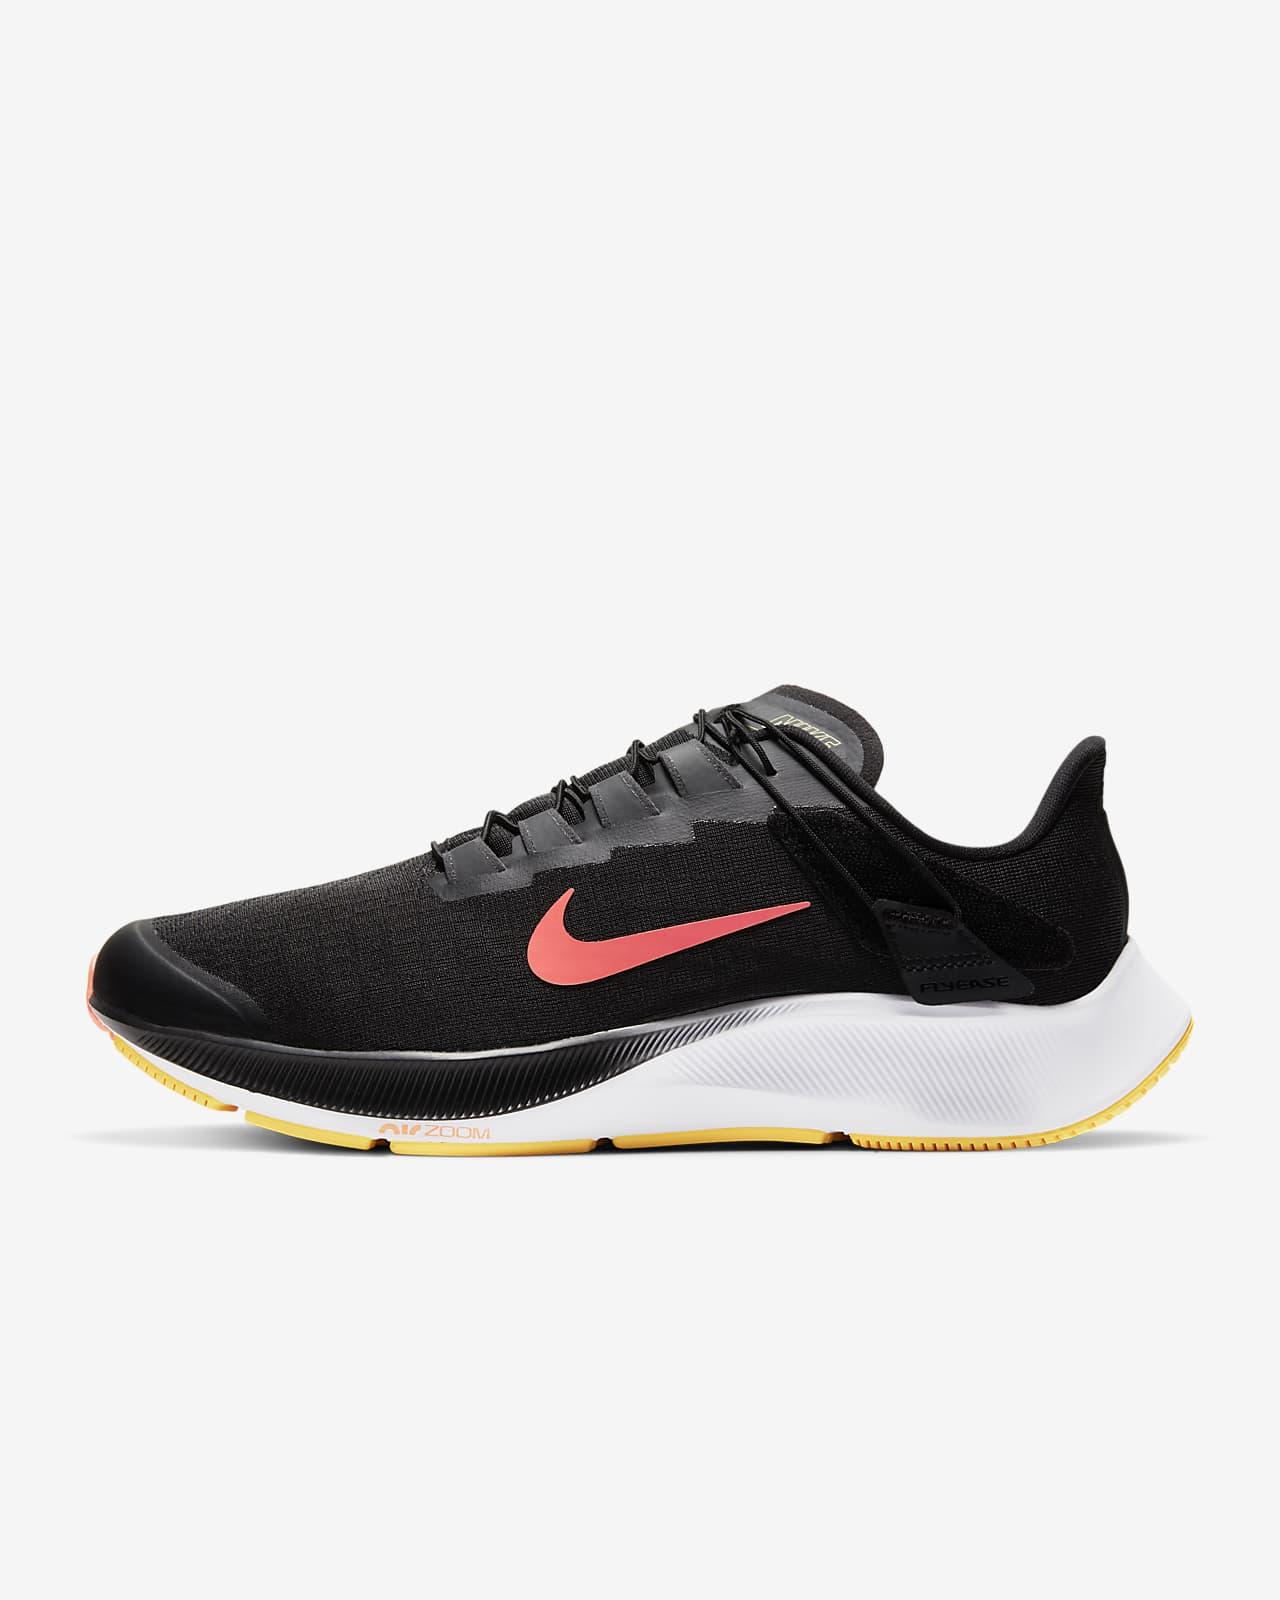 Męskie buty do biegania Nike Air Zoom Pegasus 37 FlyEase (bardzo szerokie)